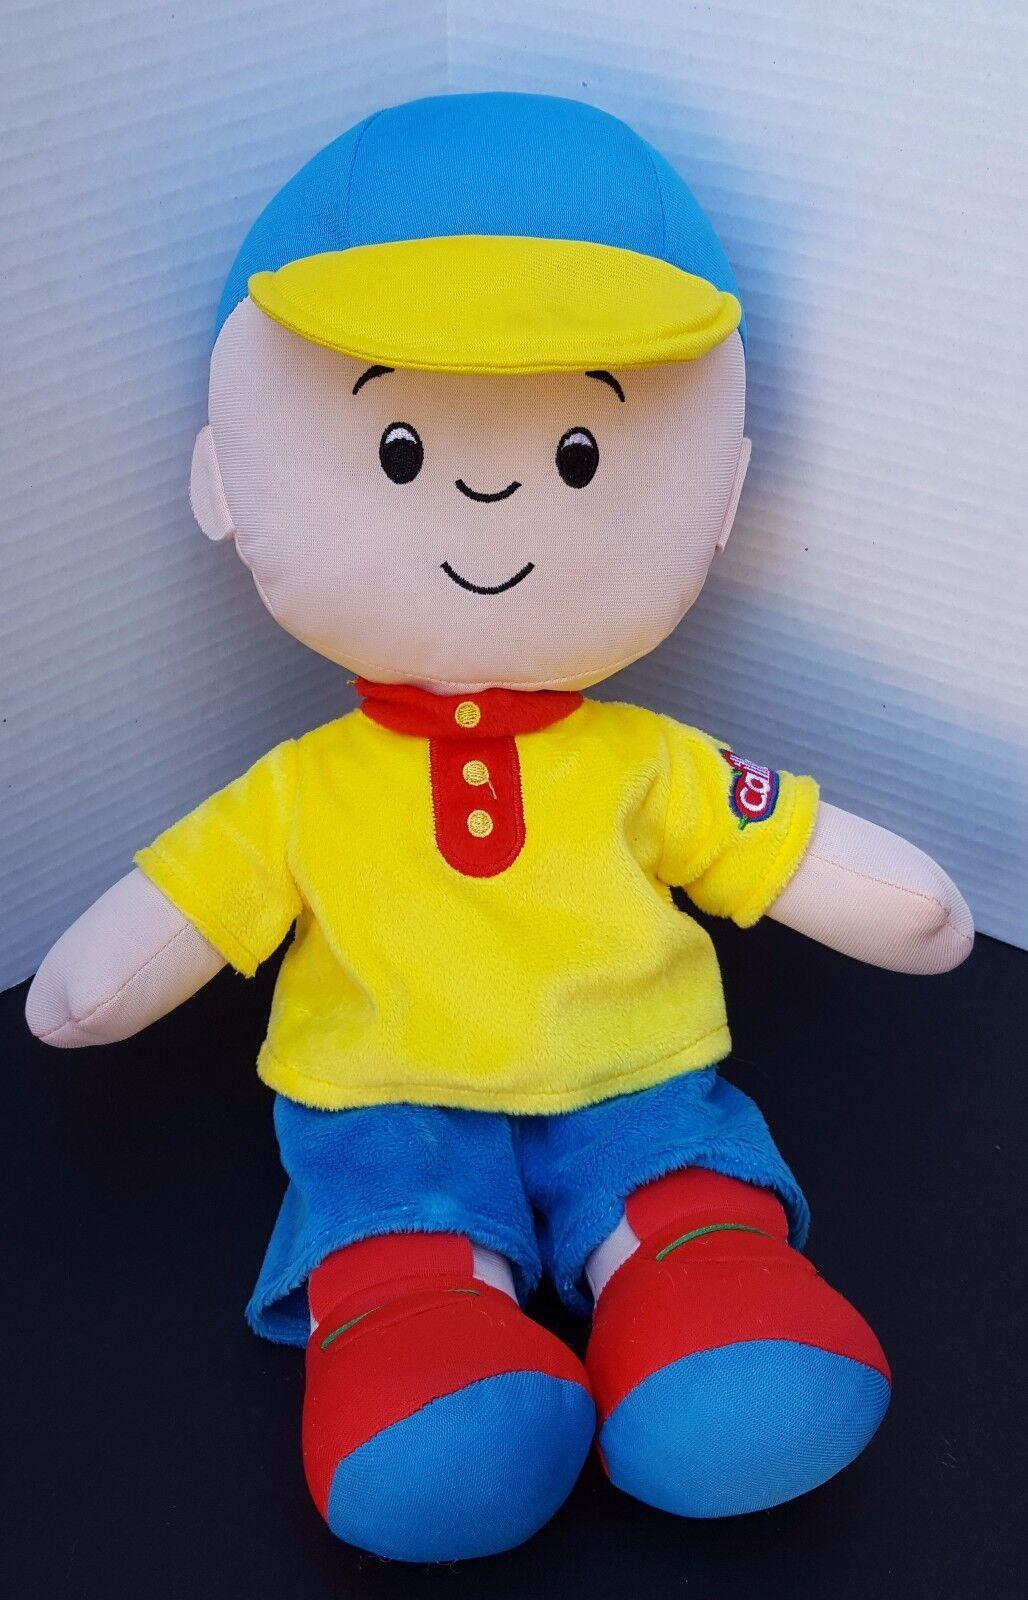 Large Caillou Plush Doll PBS KPBS Kids Cartoon Figure Pillow Buddy 15